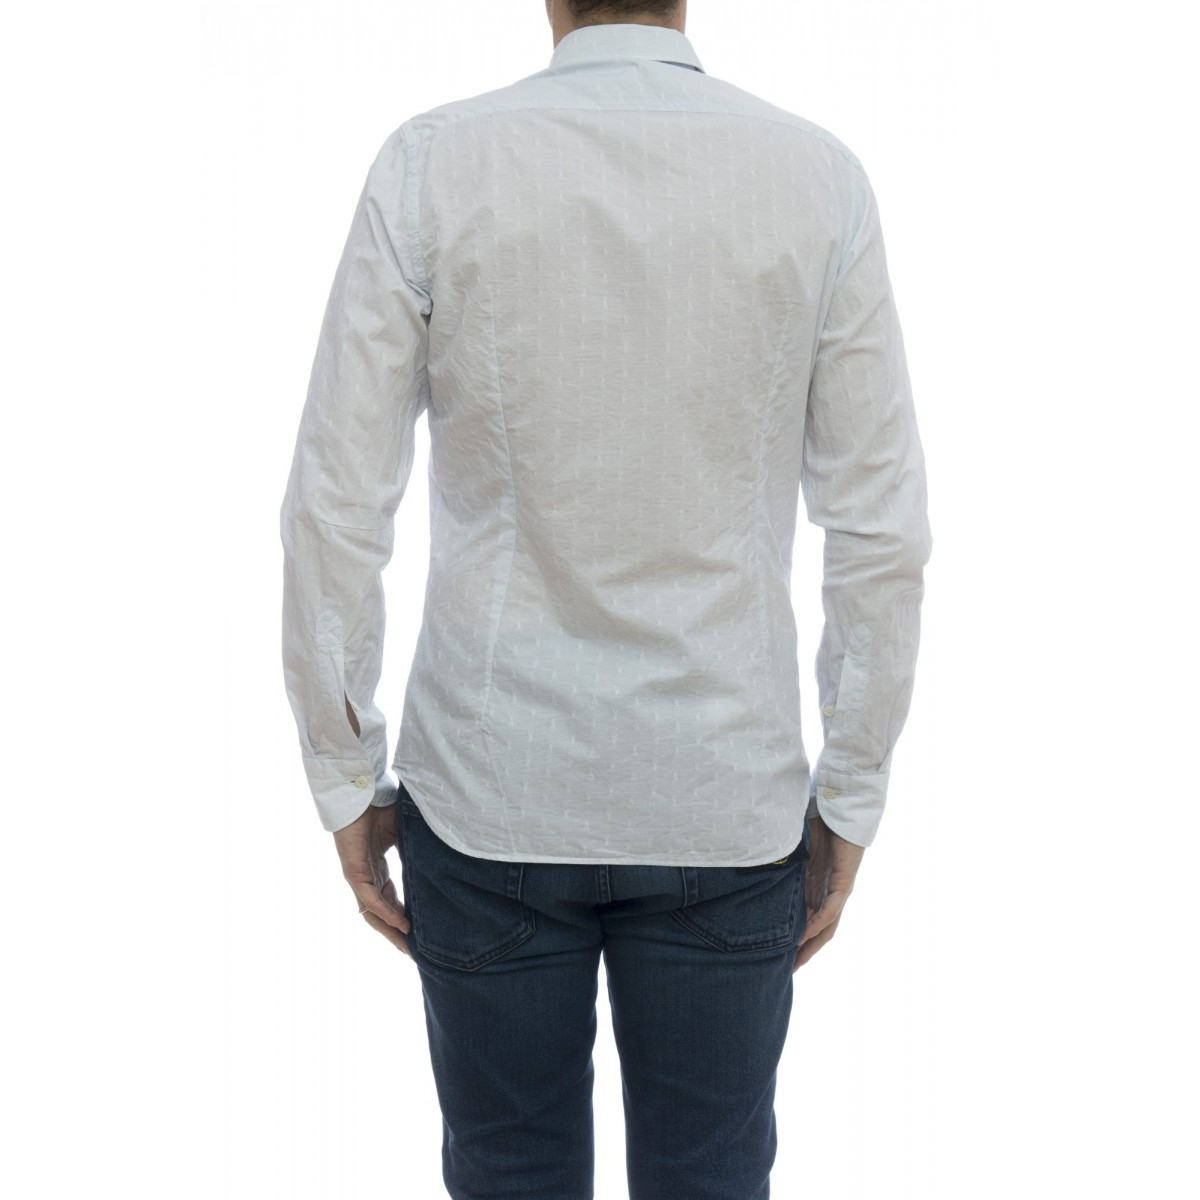 Camicia - T6p nyw tessuto alibiate